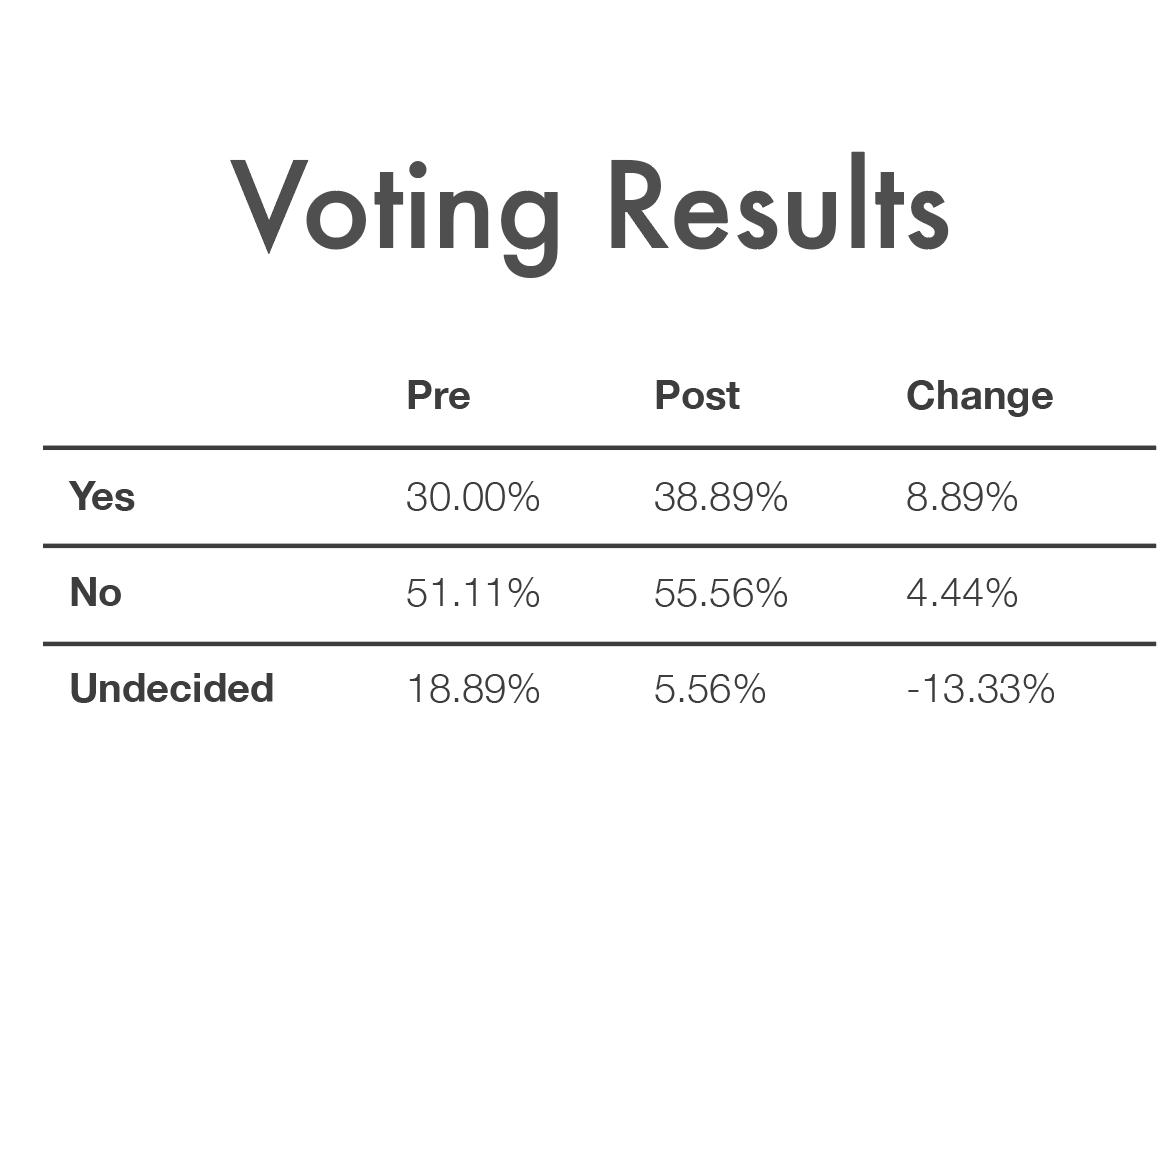 Voting_Results_November_1_2016.jpg